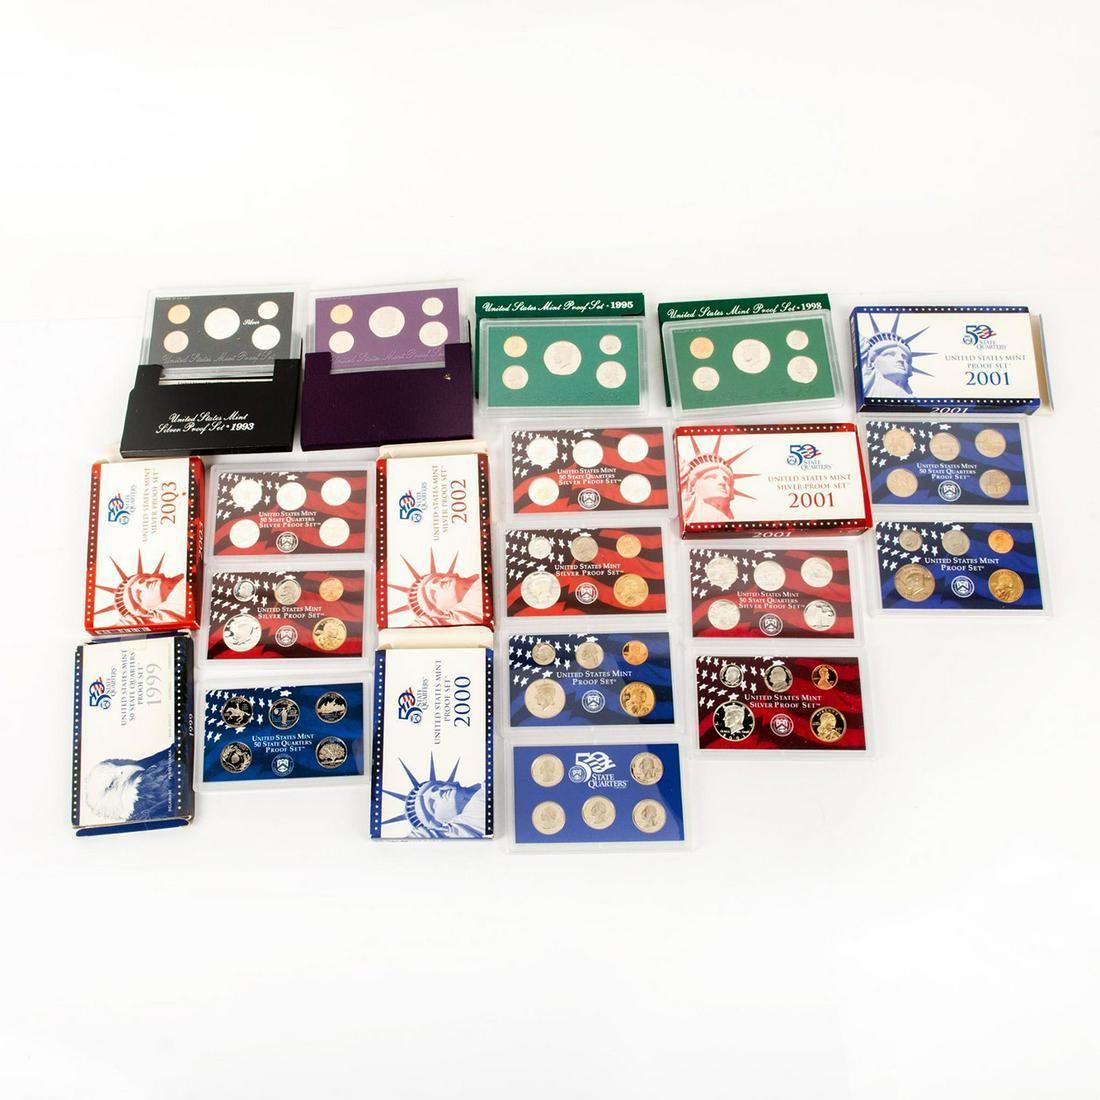 10 Us Mint Silver Proof Sets(1992-2003)